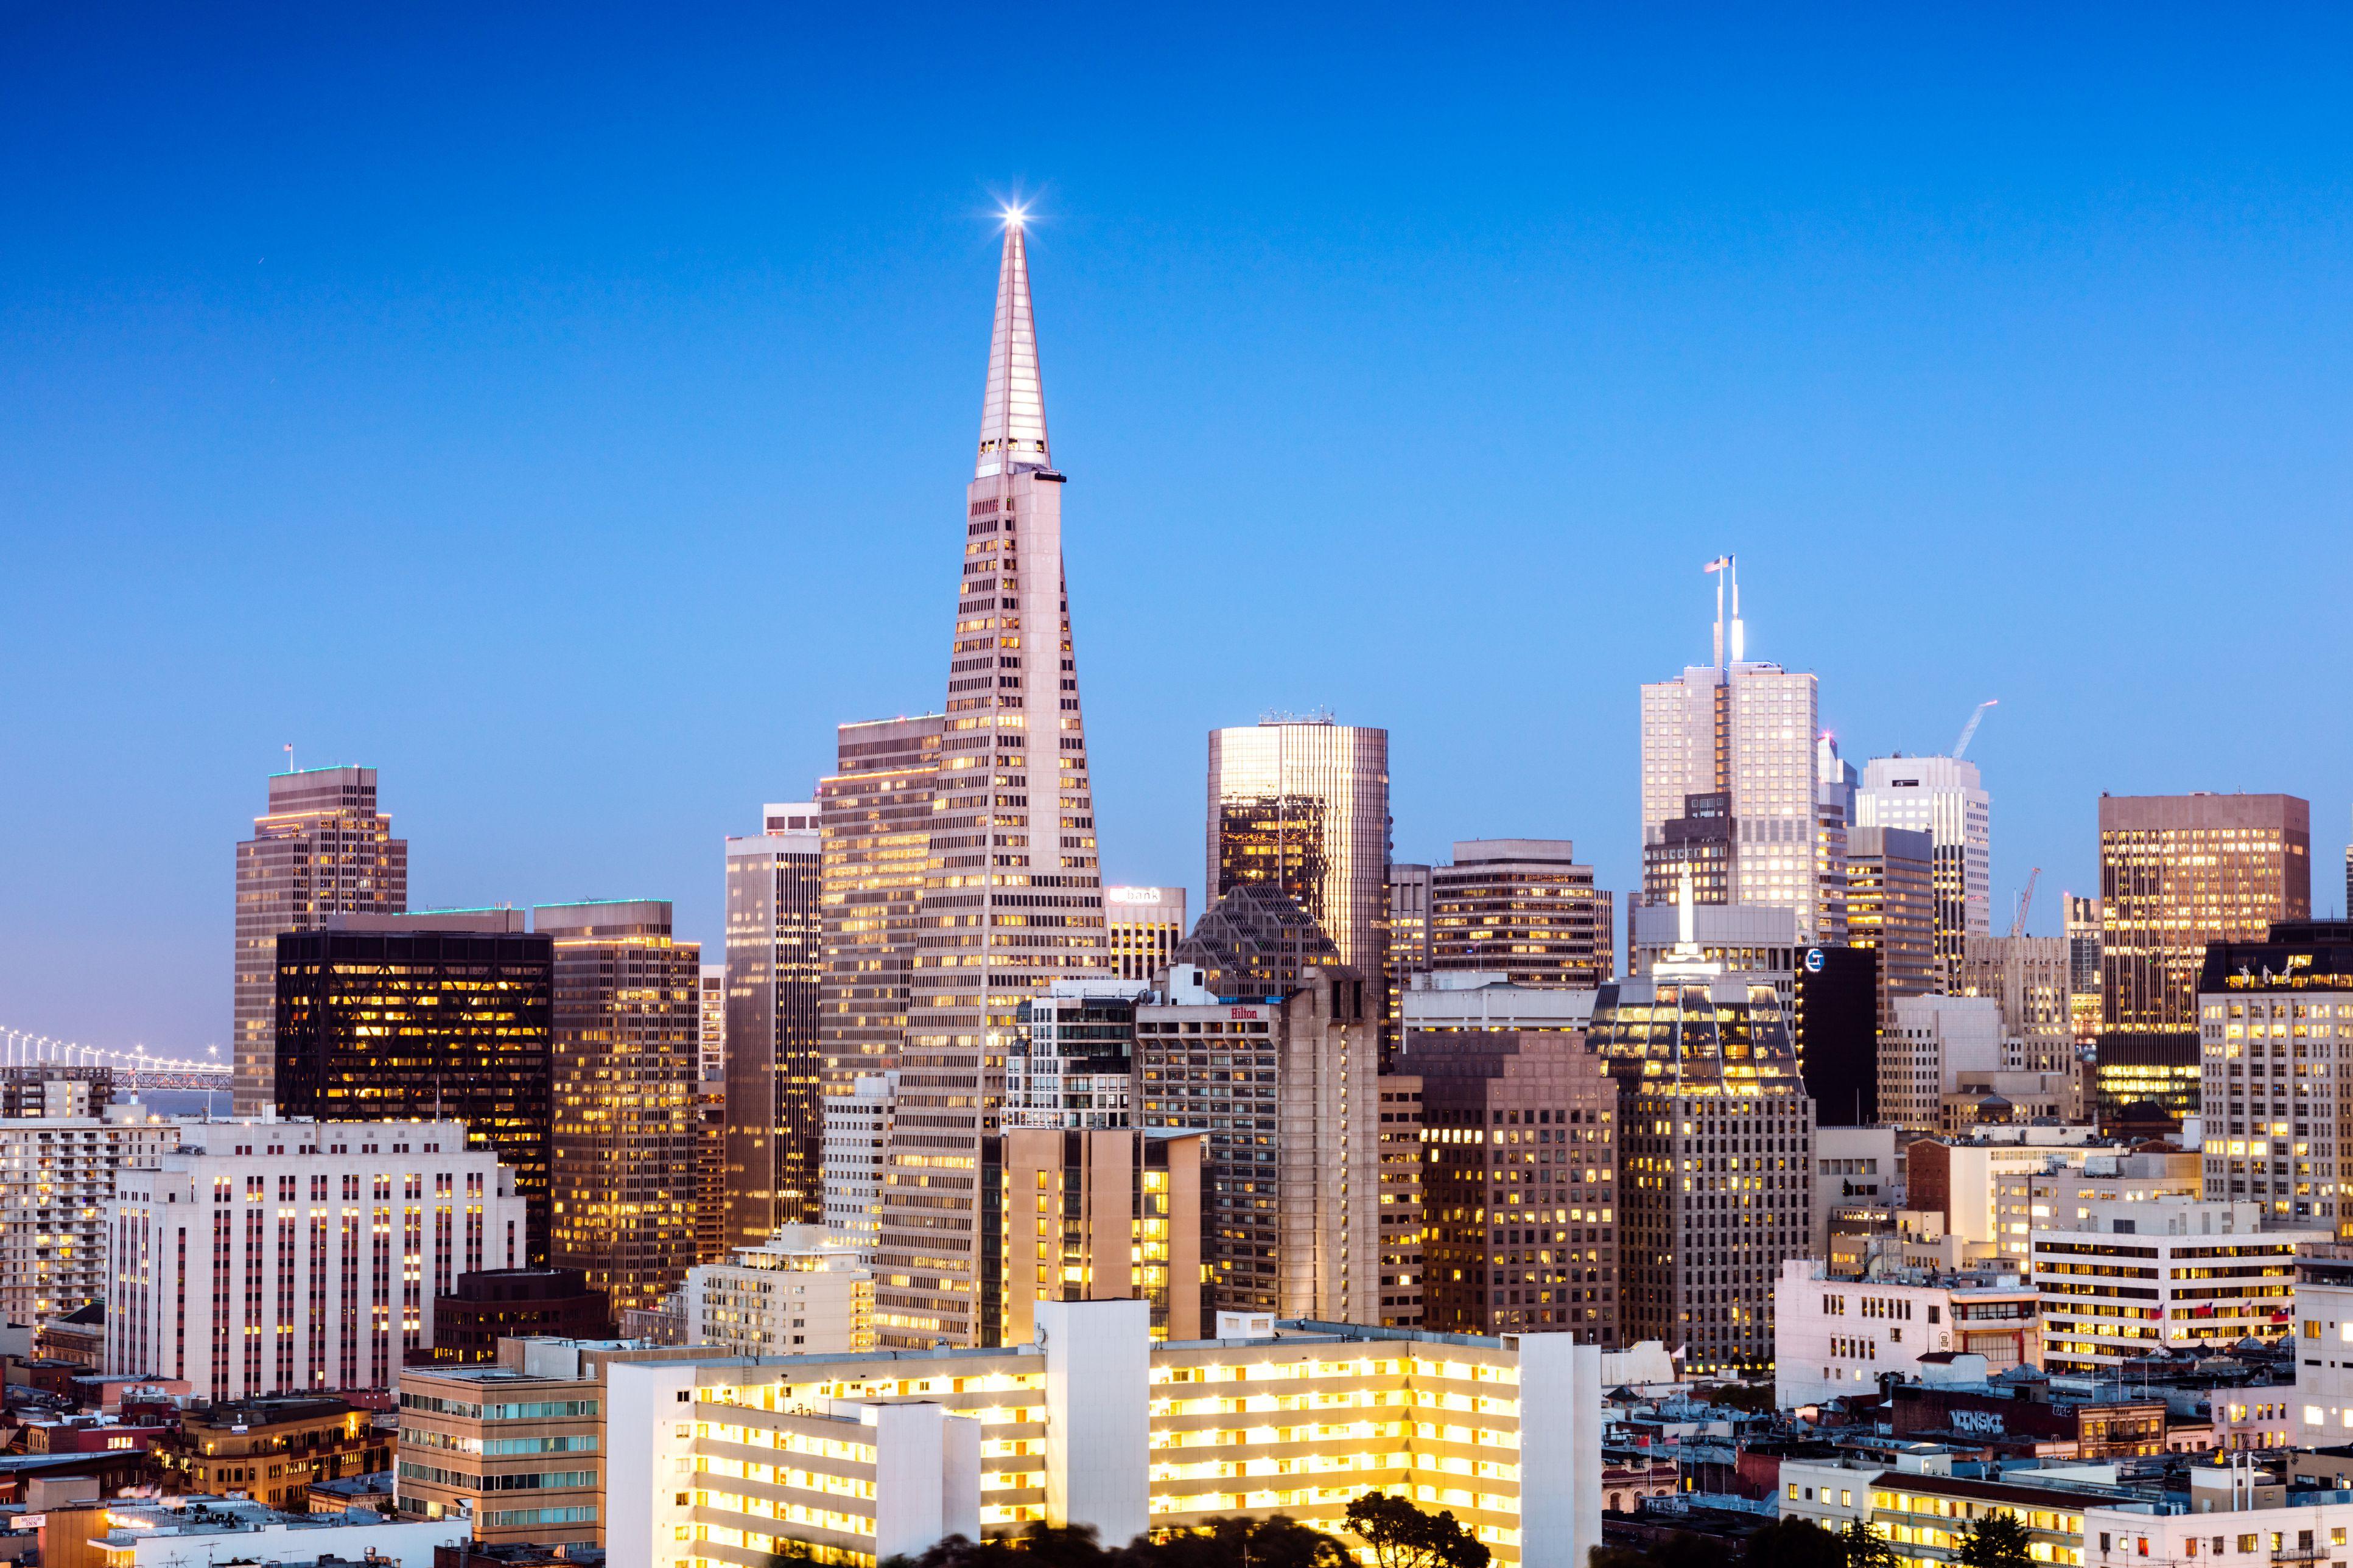 Usa Auto Insurance >> Plan a San Francisco Trip - Use These 12 Easy Steps